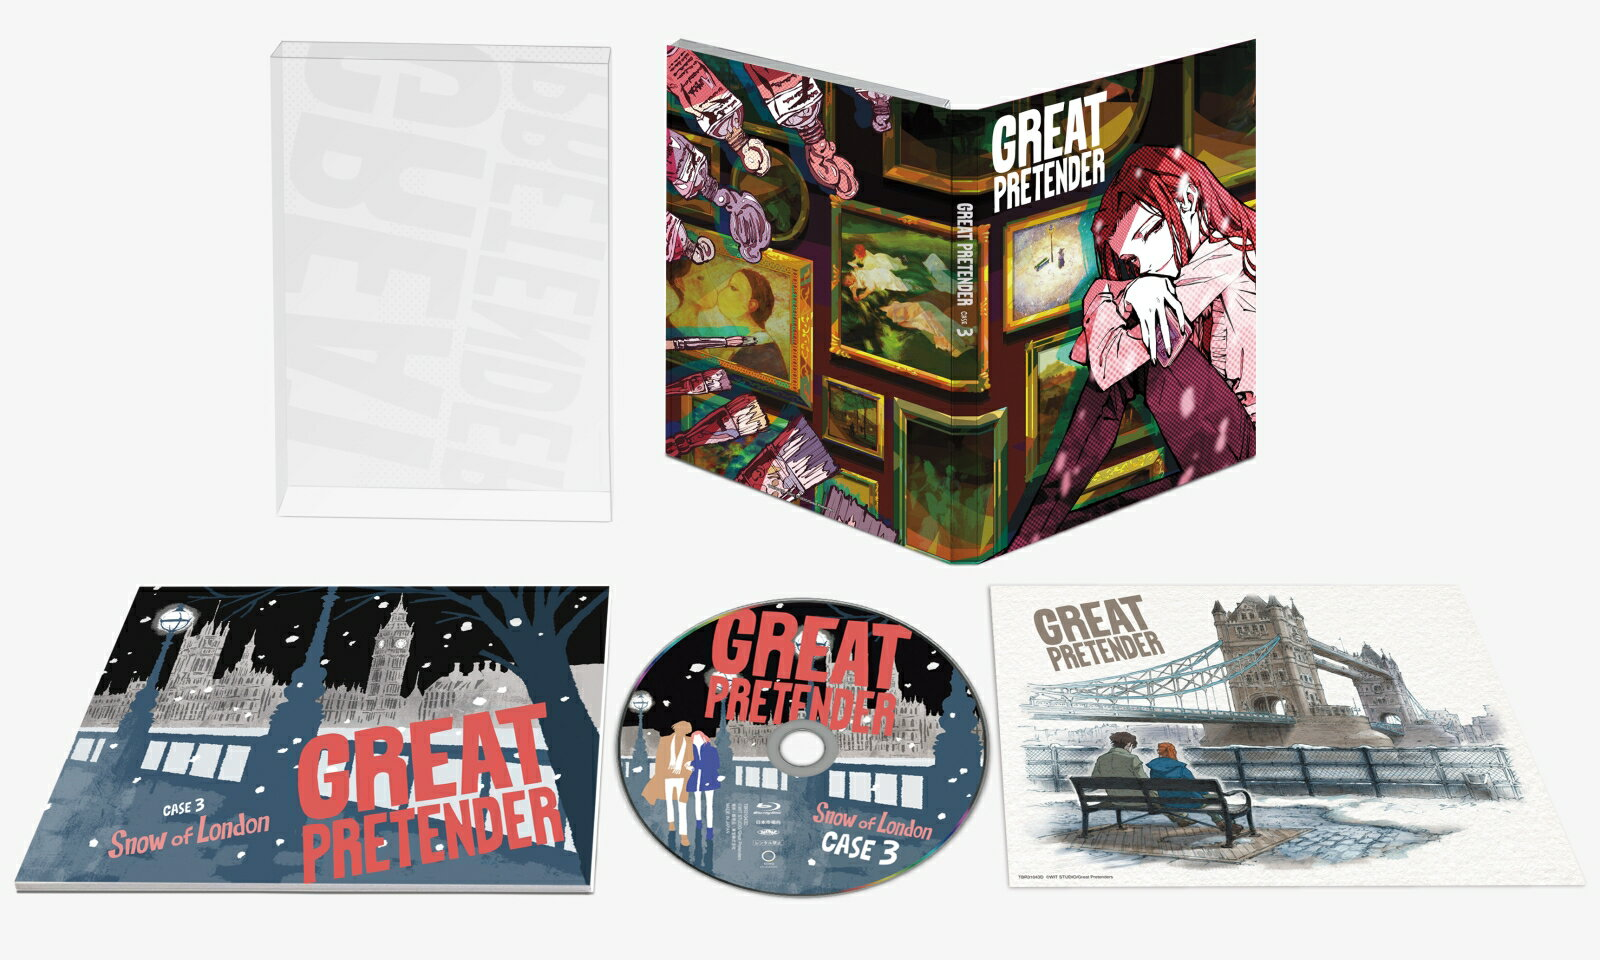 「GREAT PRETENDER」CASE 3 スノー・オブ・ロンドン【Blu-ray】 [ 小林千晃 ]画像